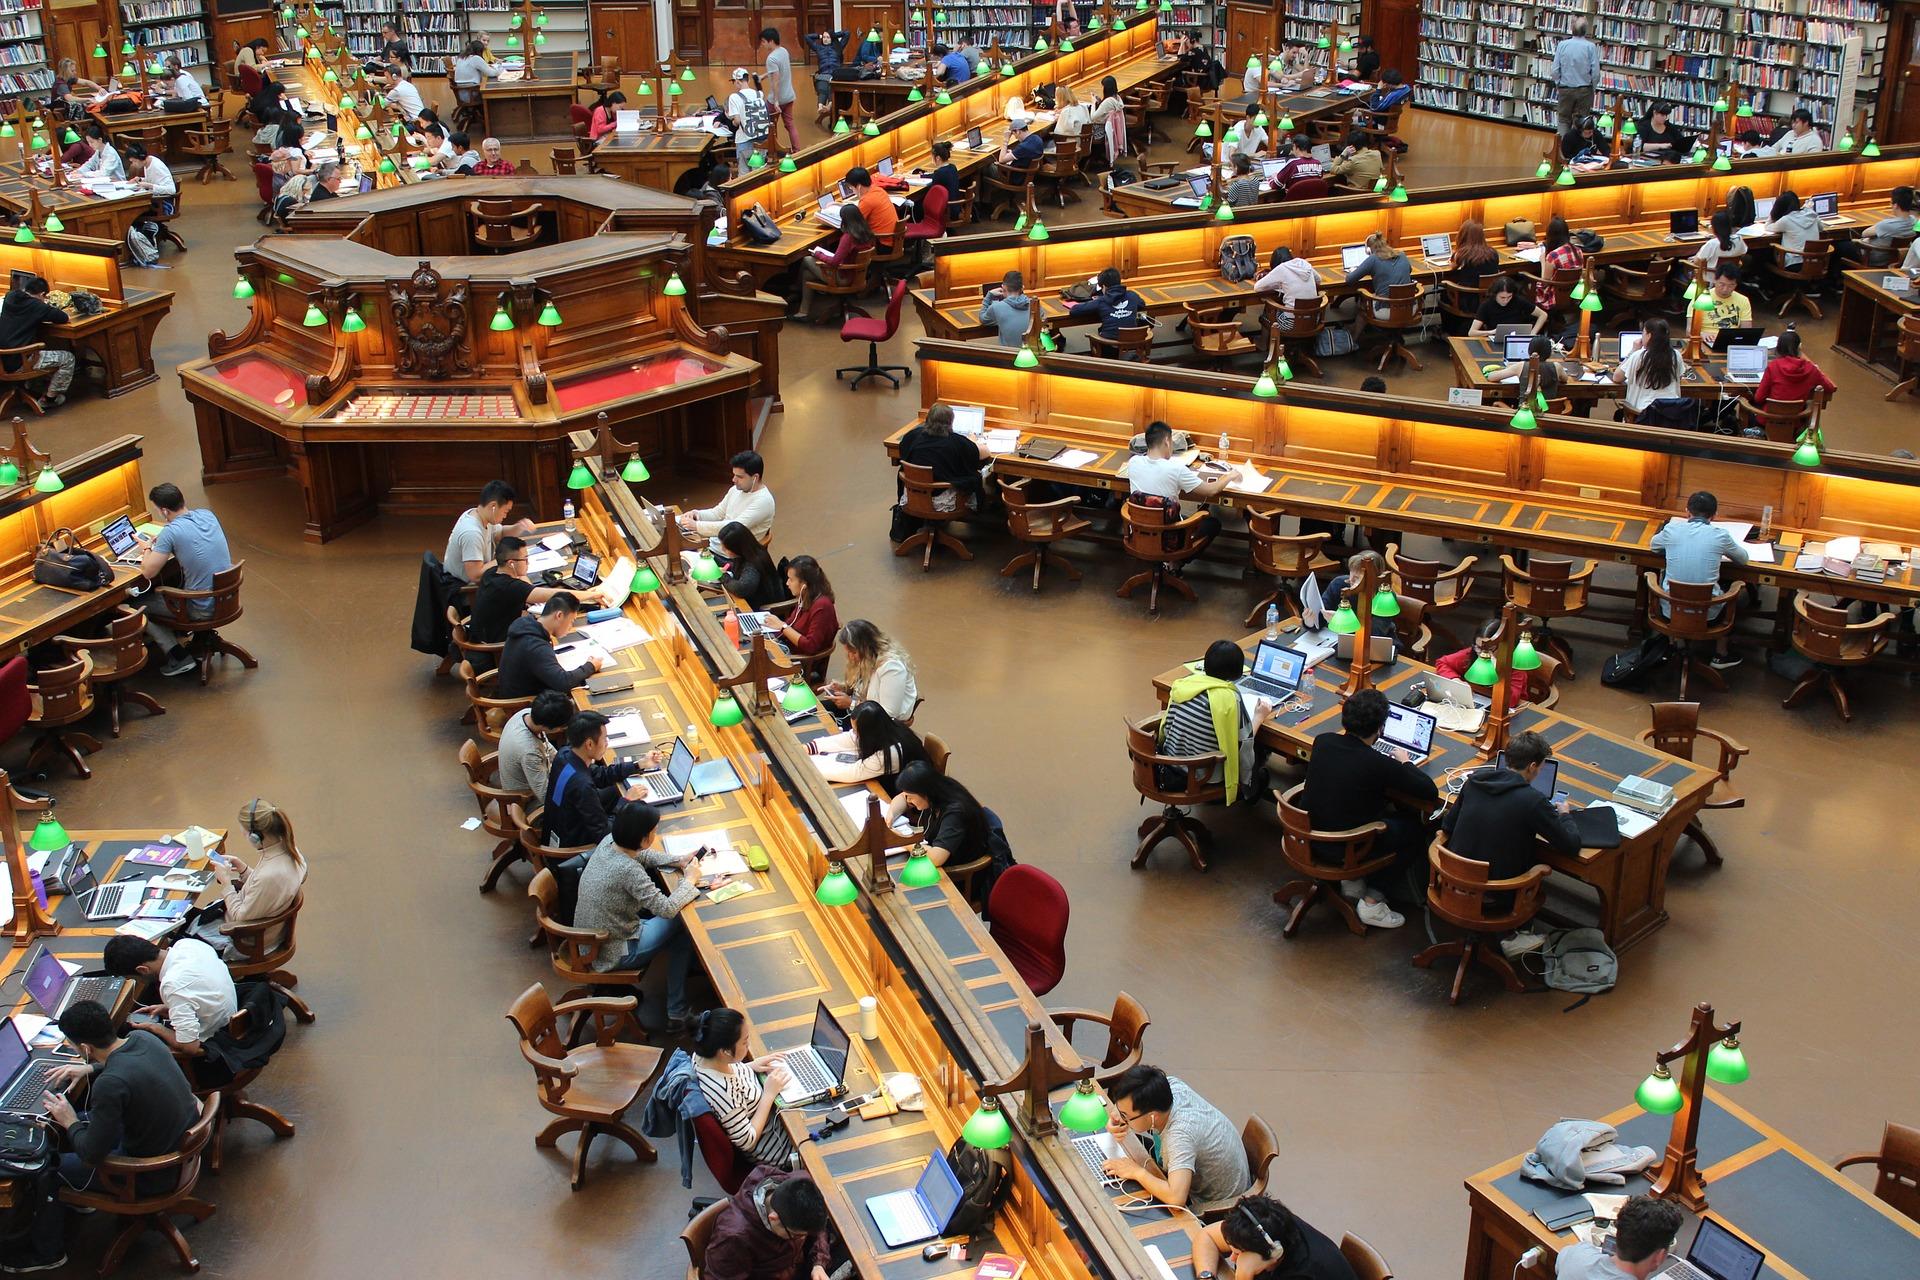 Criteria for awarding scholarhips